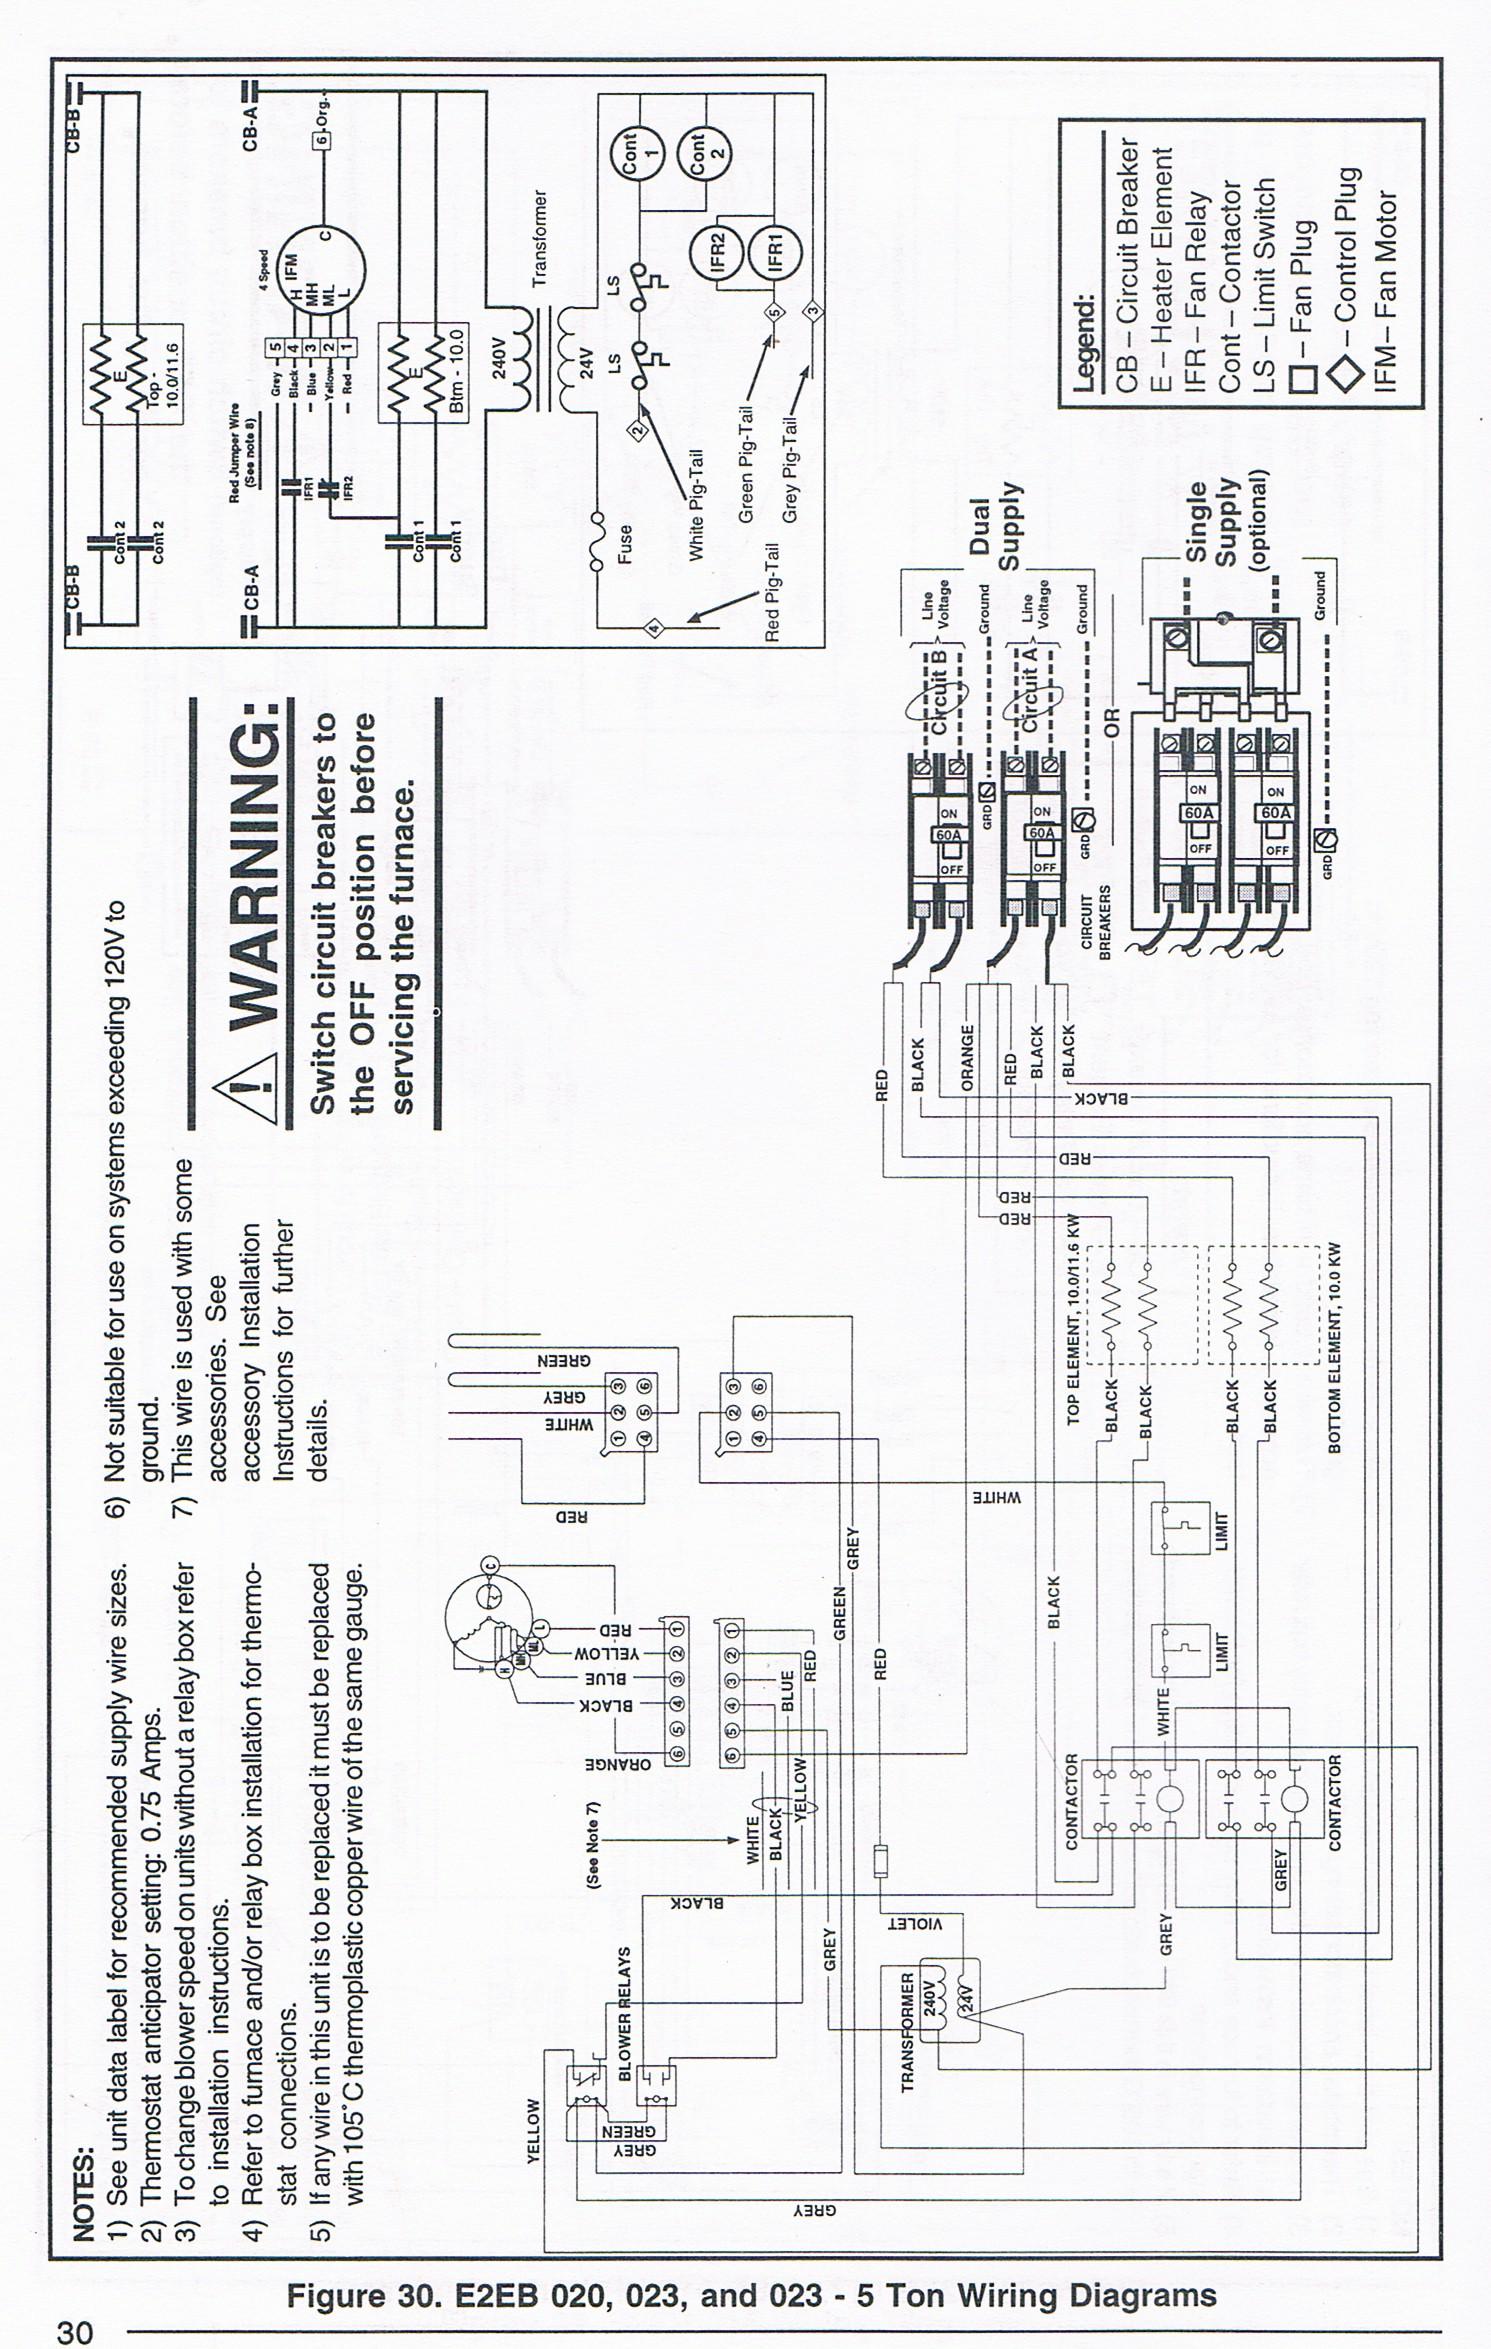 Unique Ke70 Wiring Diagram Motif - Electrical Circuit Diagram Ideas ...